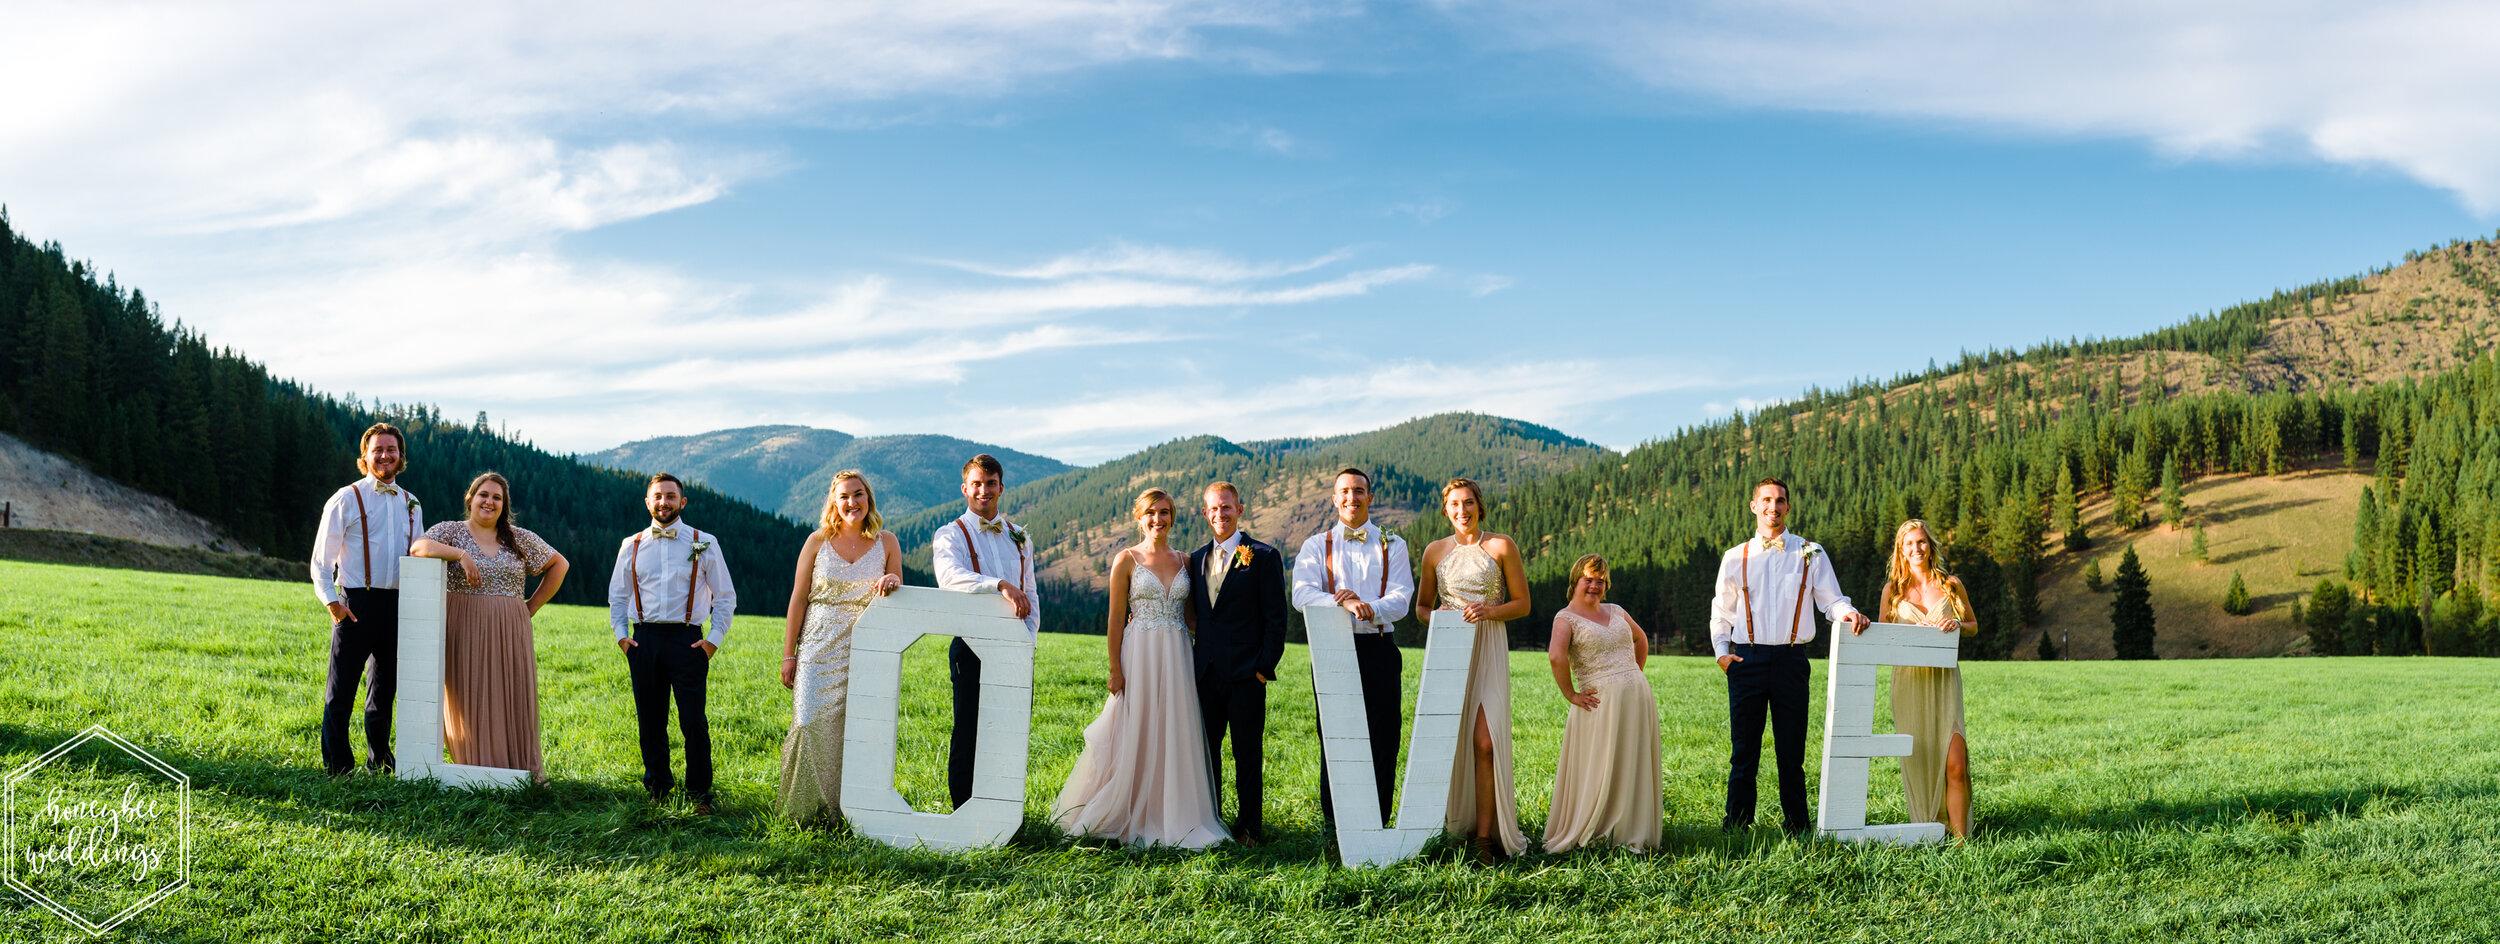 100Seven Mile Meadows Wedding_Montana Wedding Photographer_Jamie & Wes_Honeybee Weddings_September 07, 2019-1585-Pano.jpg